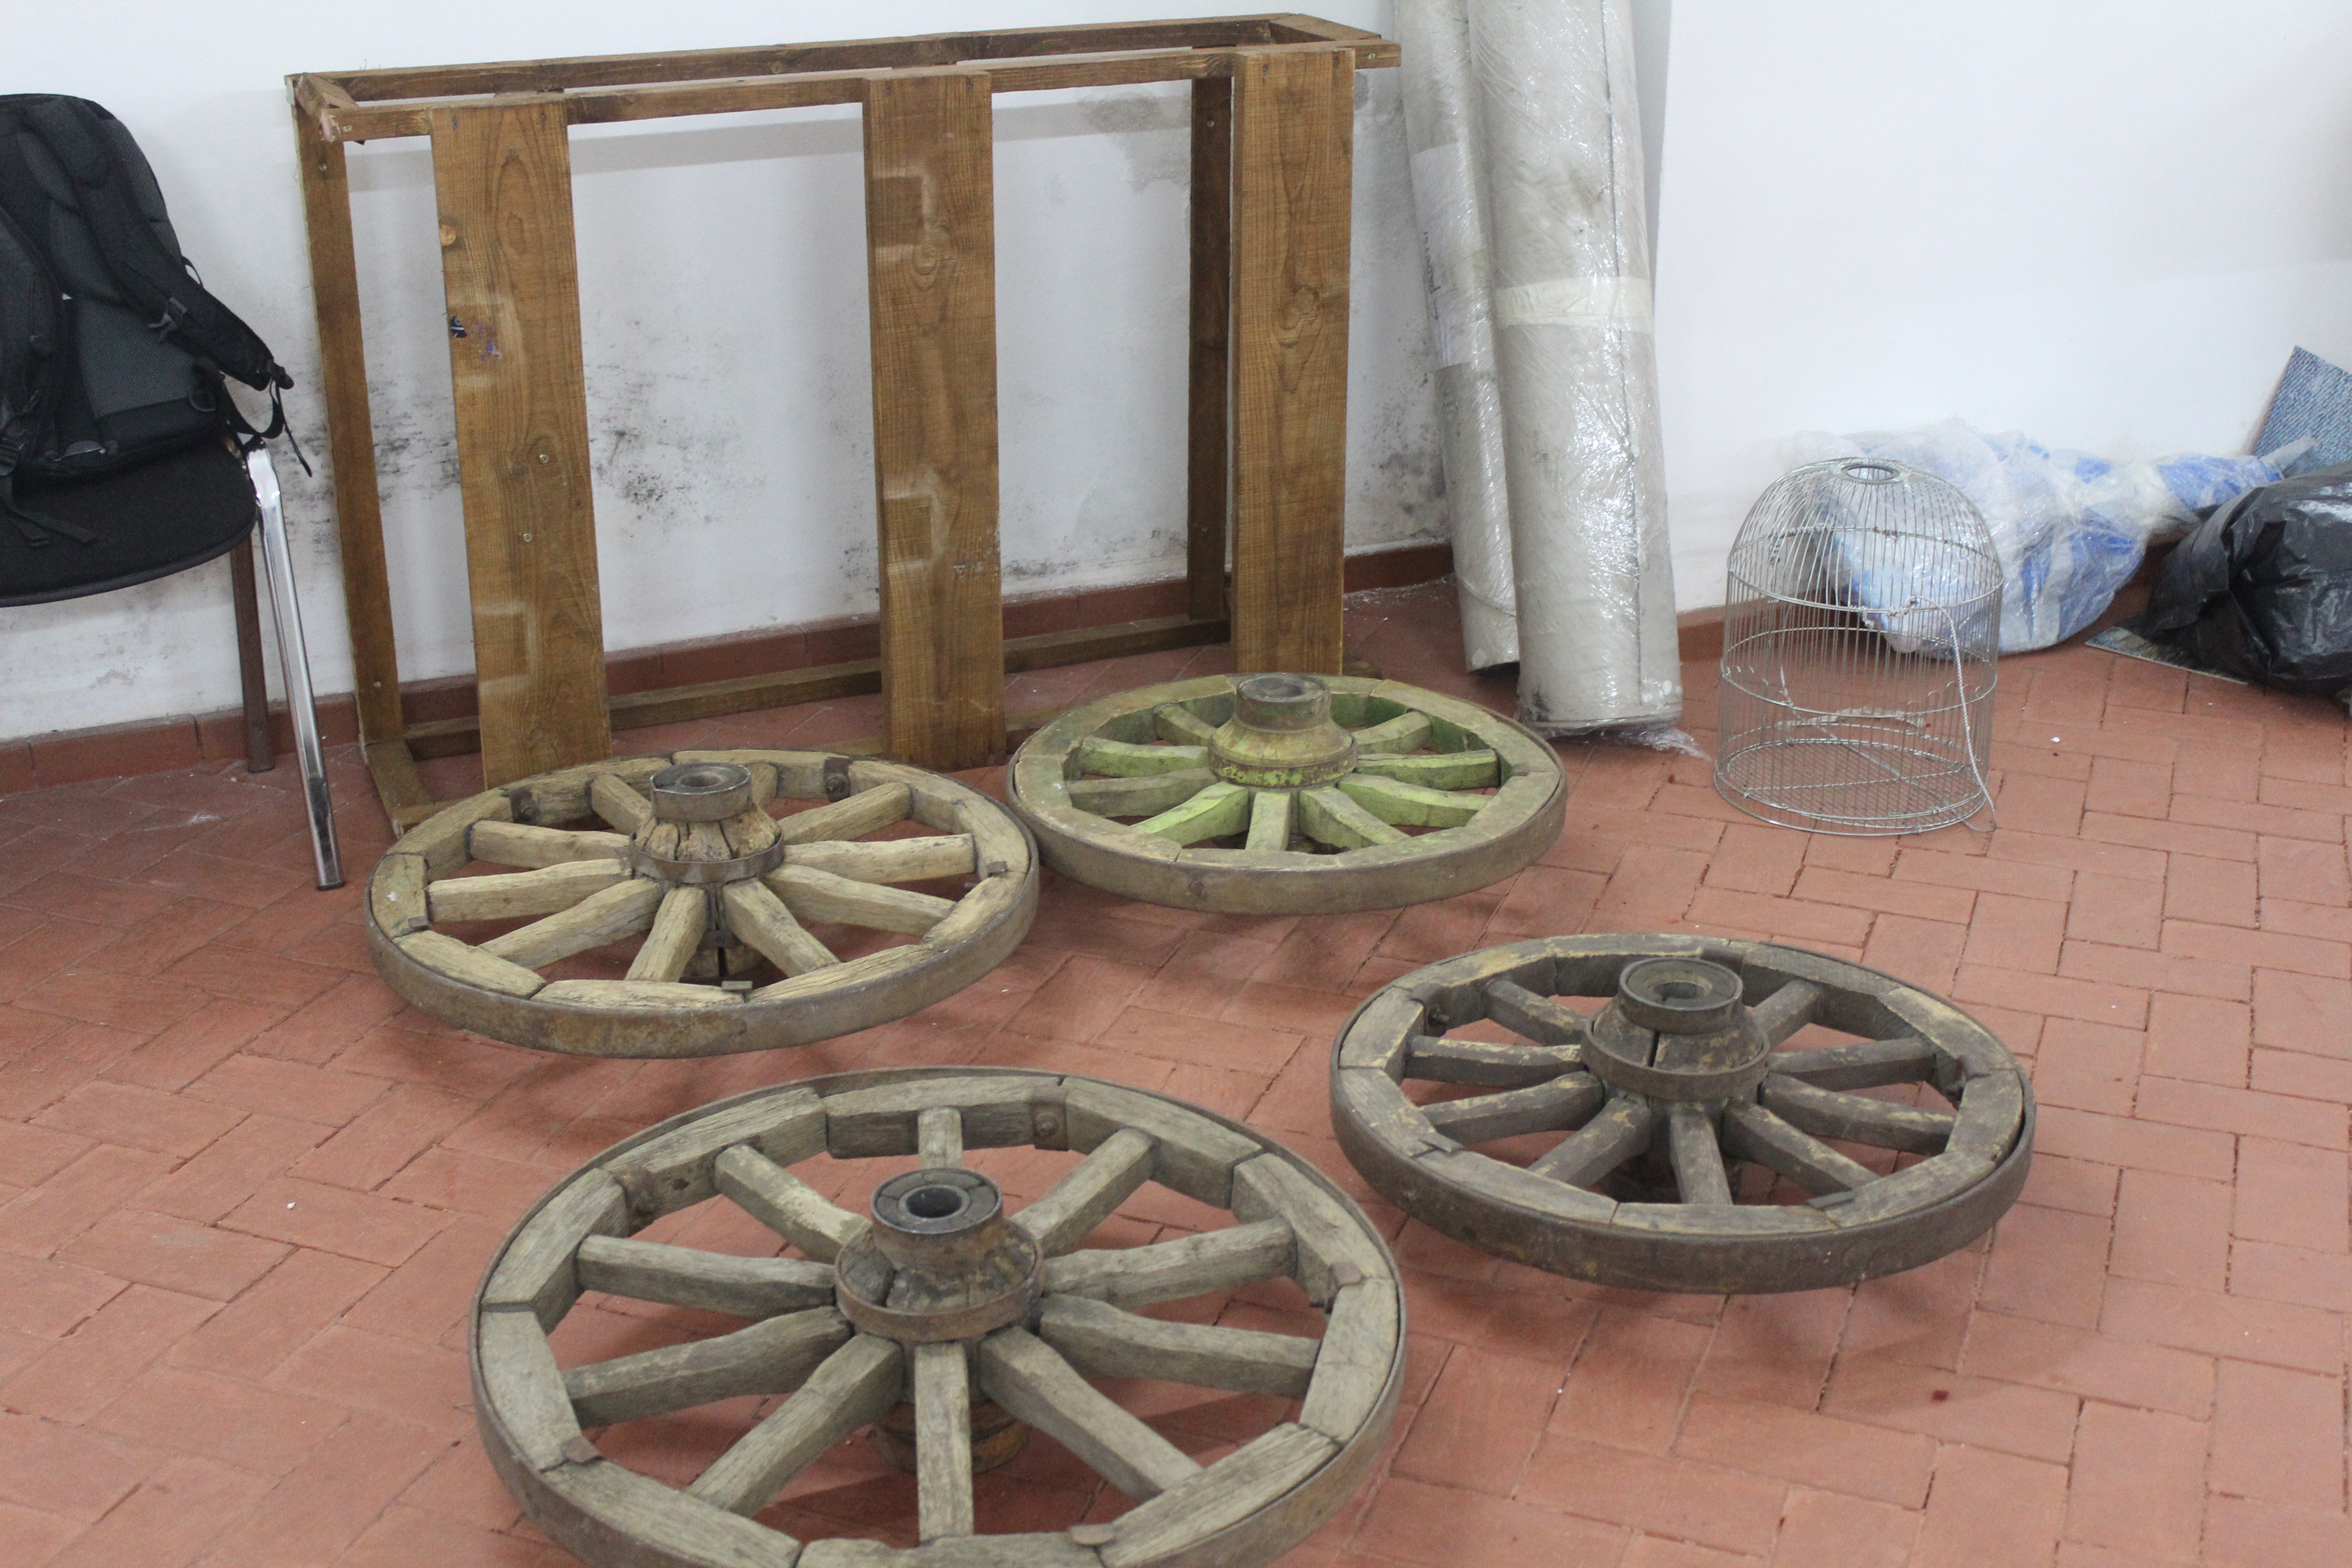 Експонати виставок форуму «СлободаКульт» уже доставили в Ужгород